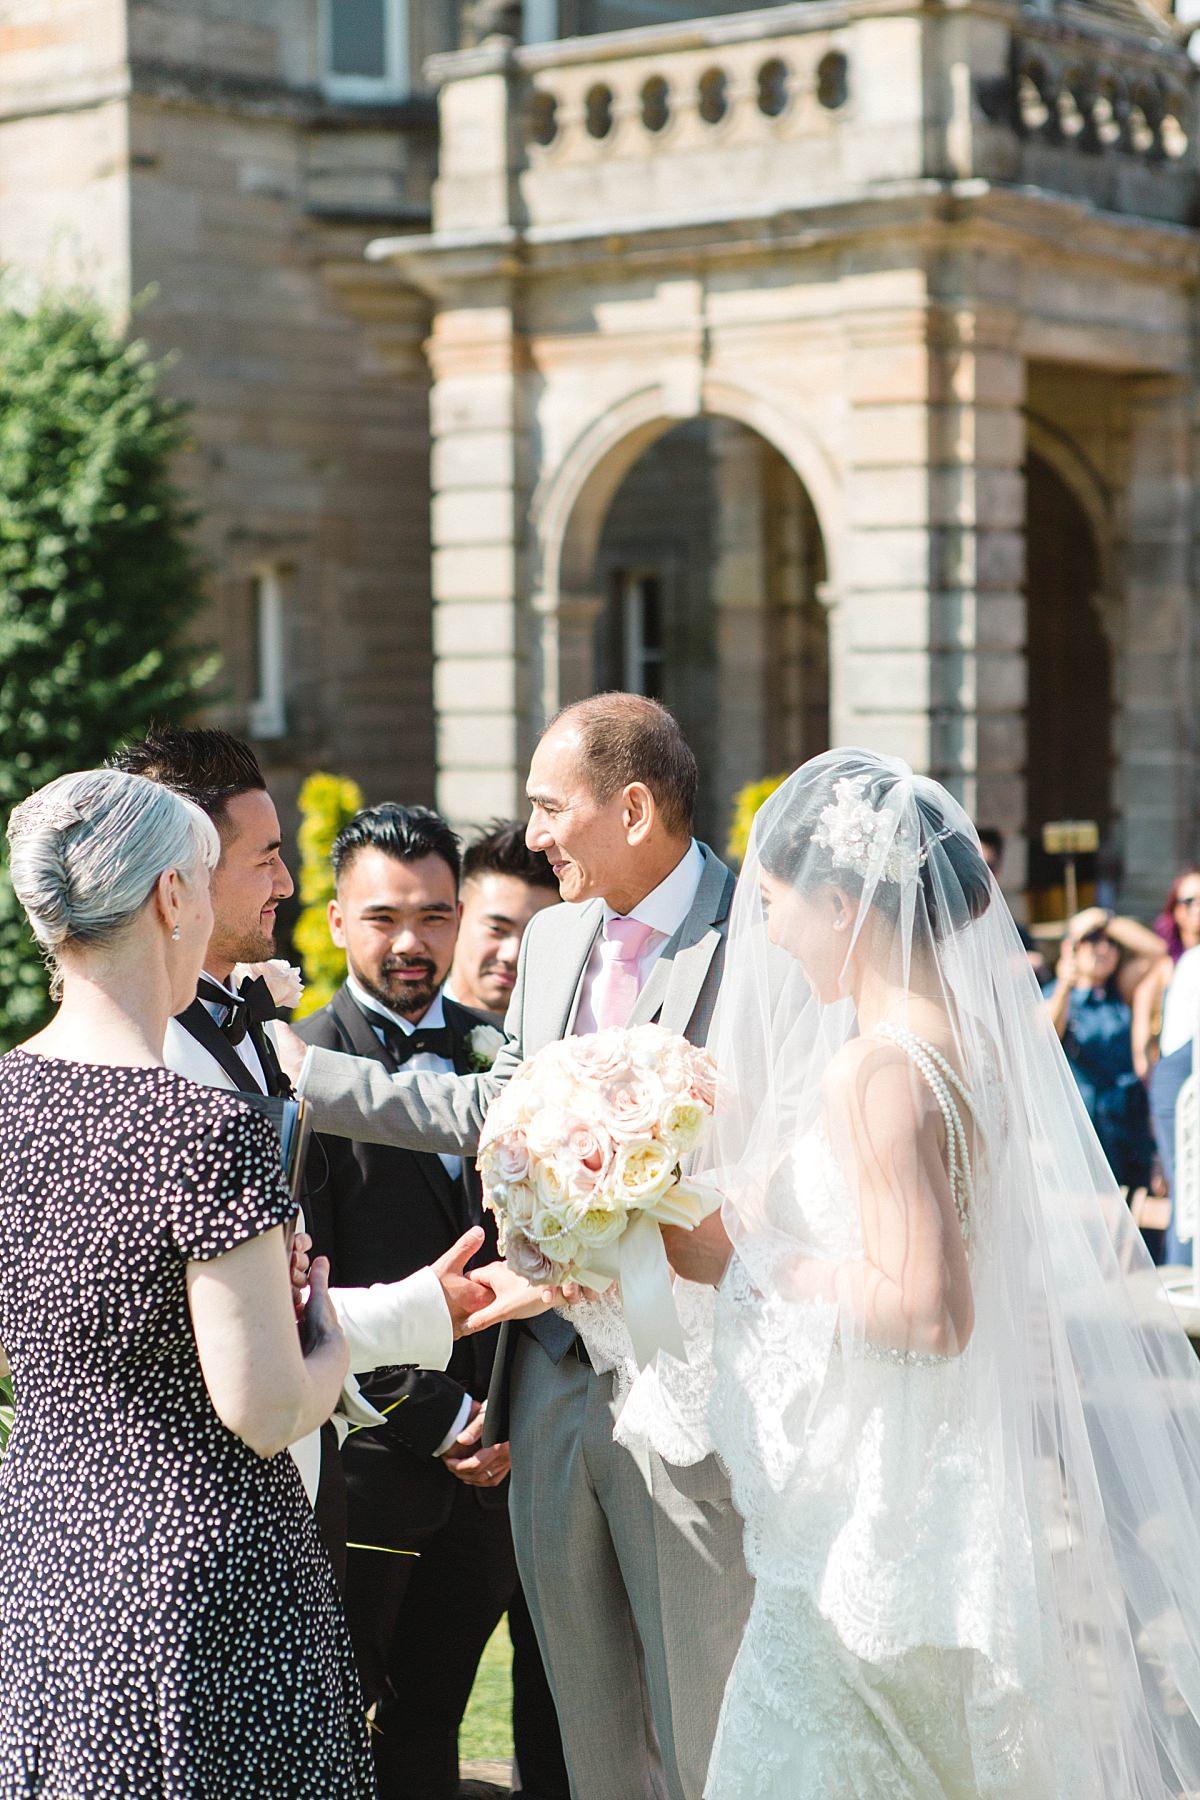 Solsgirth House Wedding Scotland 6-3.jpg